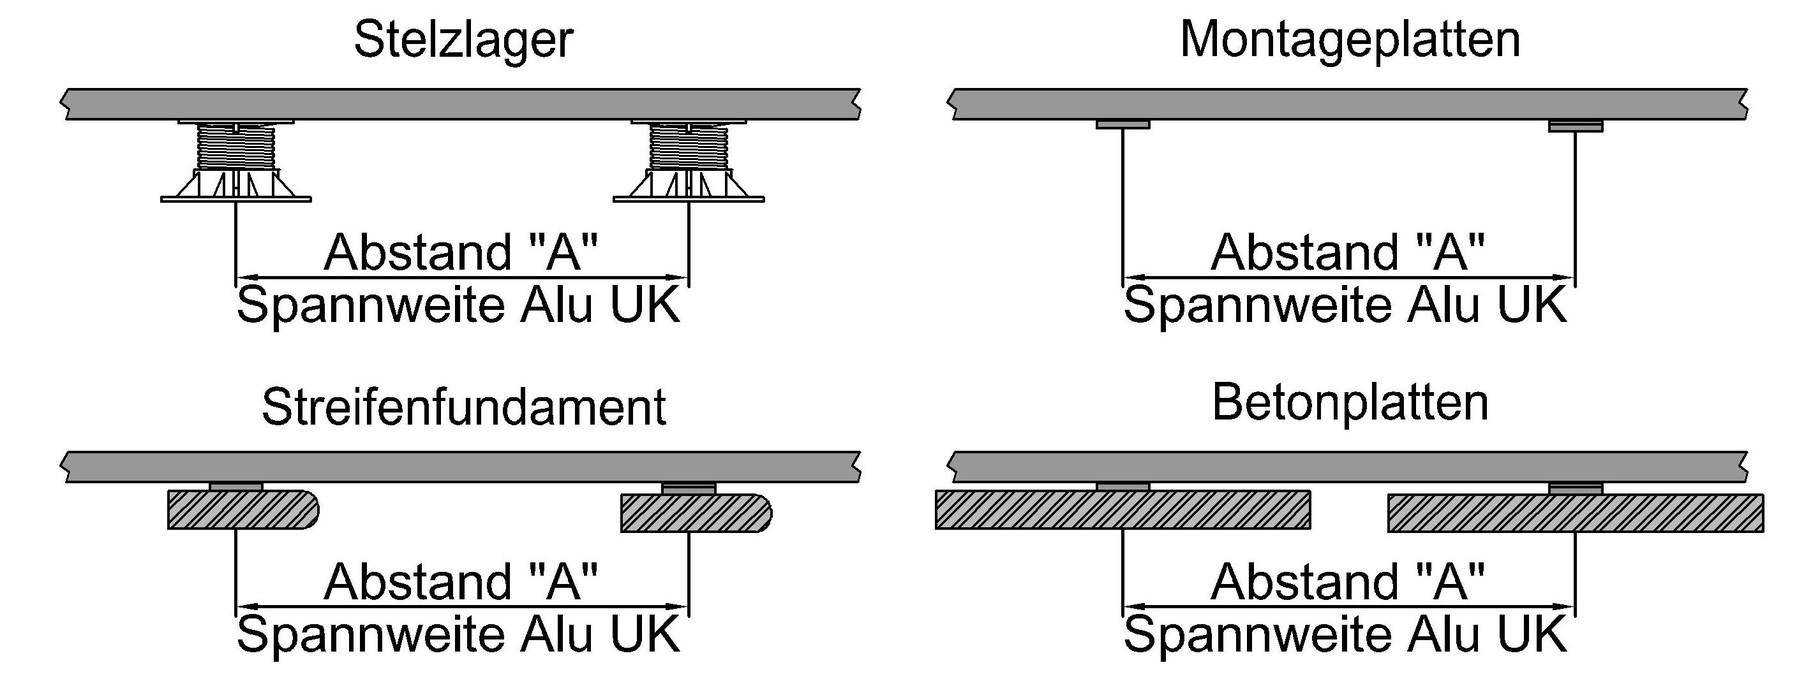 bpc wpc terrassen len alu uk abstand spannweite aluminium unterkonstruktion stelzlager plattenlager montageplatten terrassenplatten betonplatten